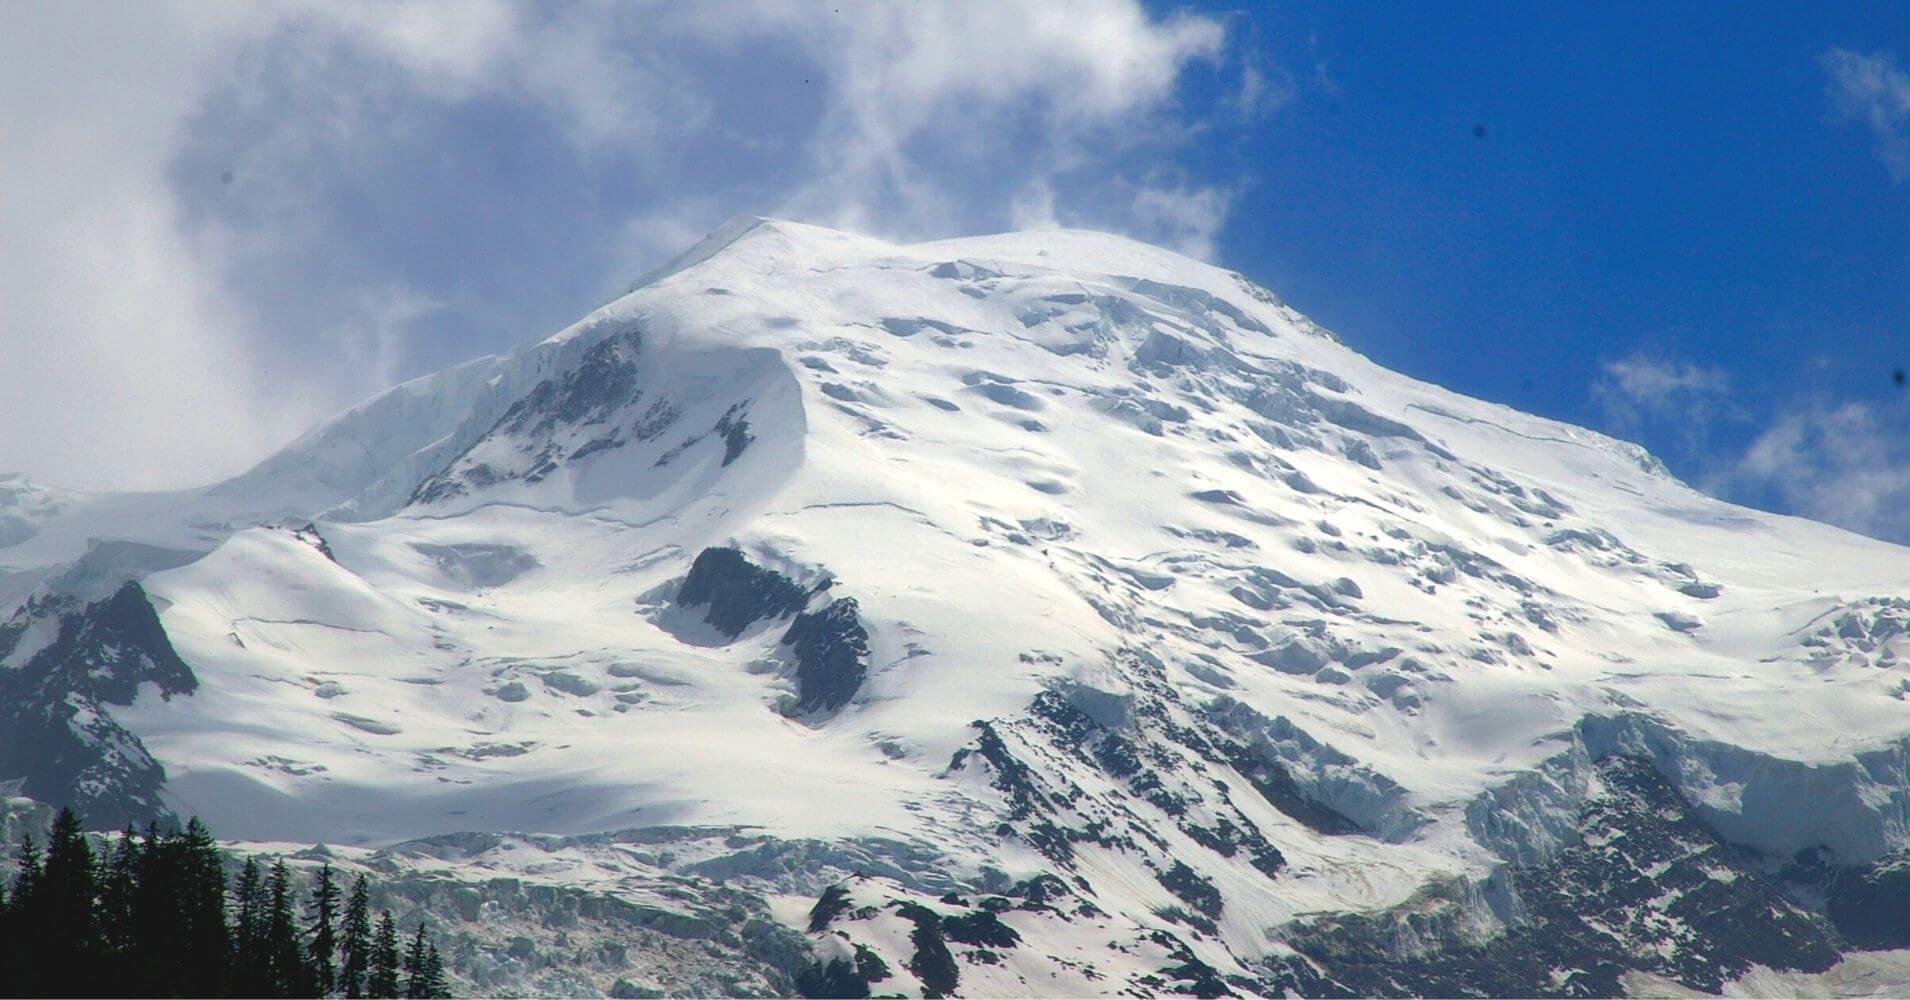 Cumbre del Pico del Mont Blanc. Francia, Italia. Cordillera de los Alpes.